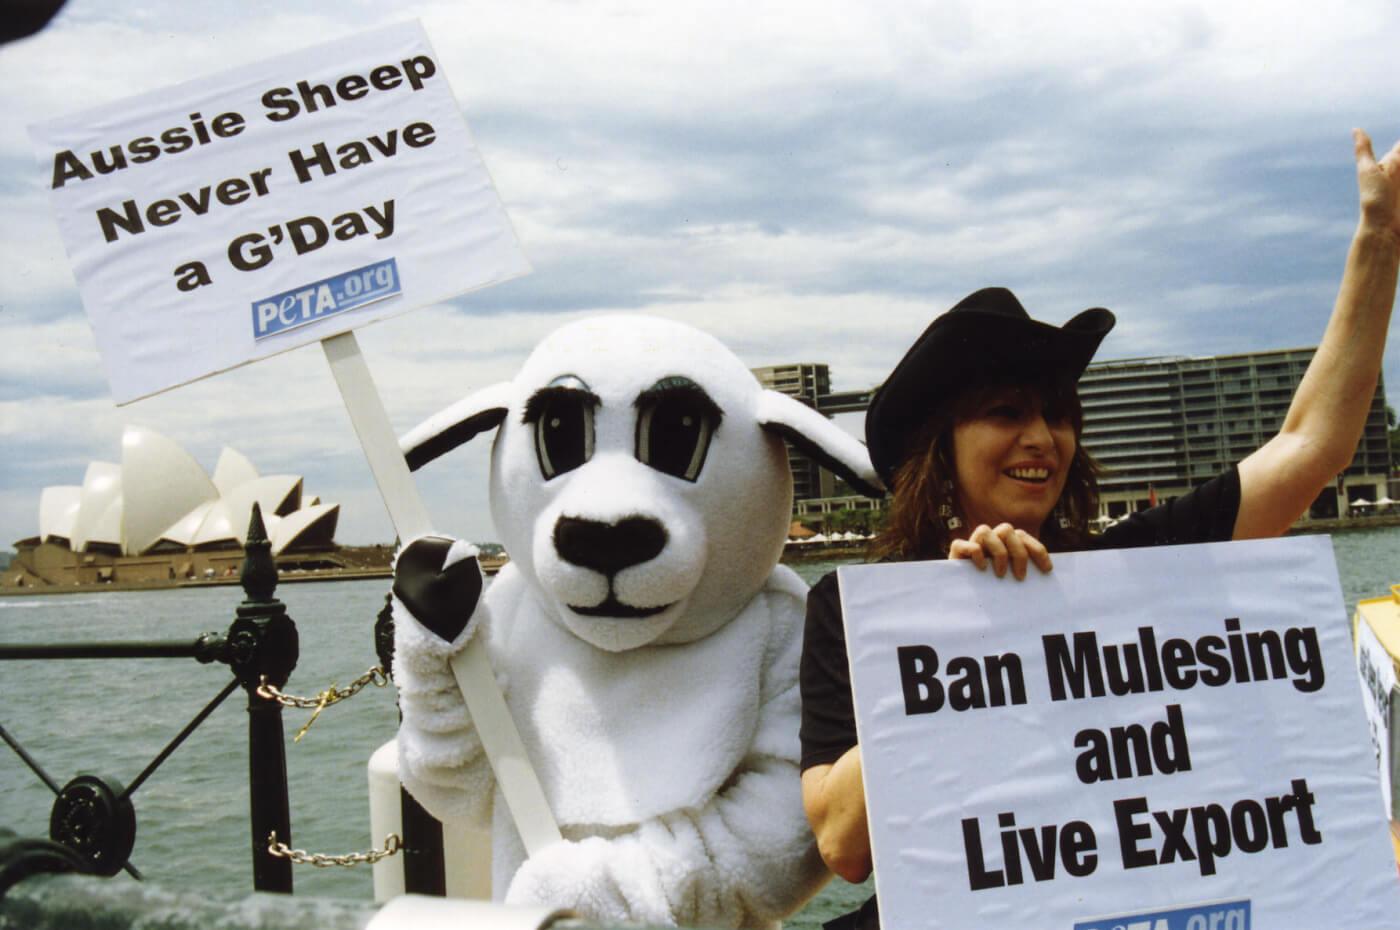 Chrissie Hynde in Sydney protesting mulesing.